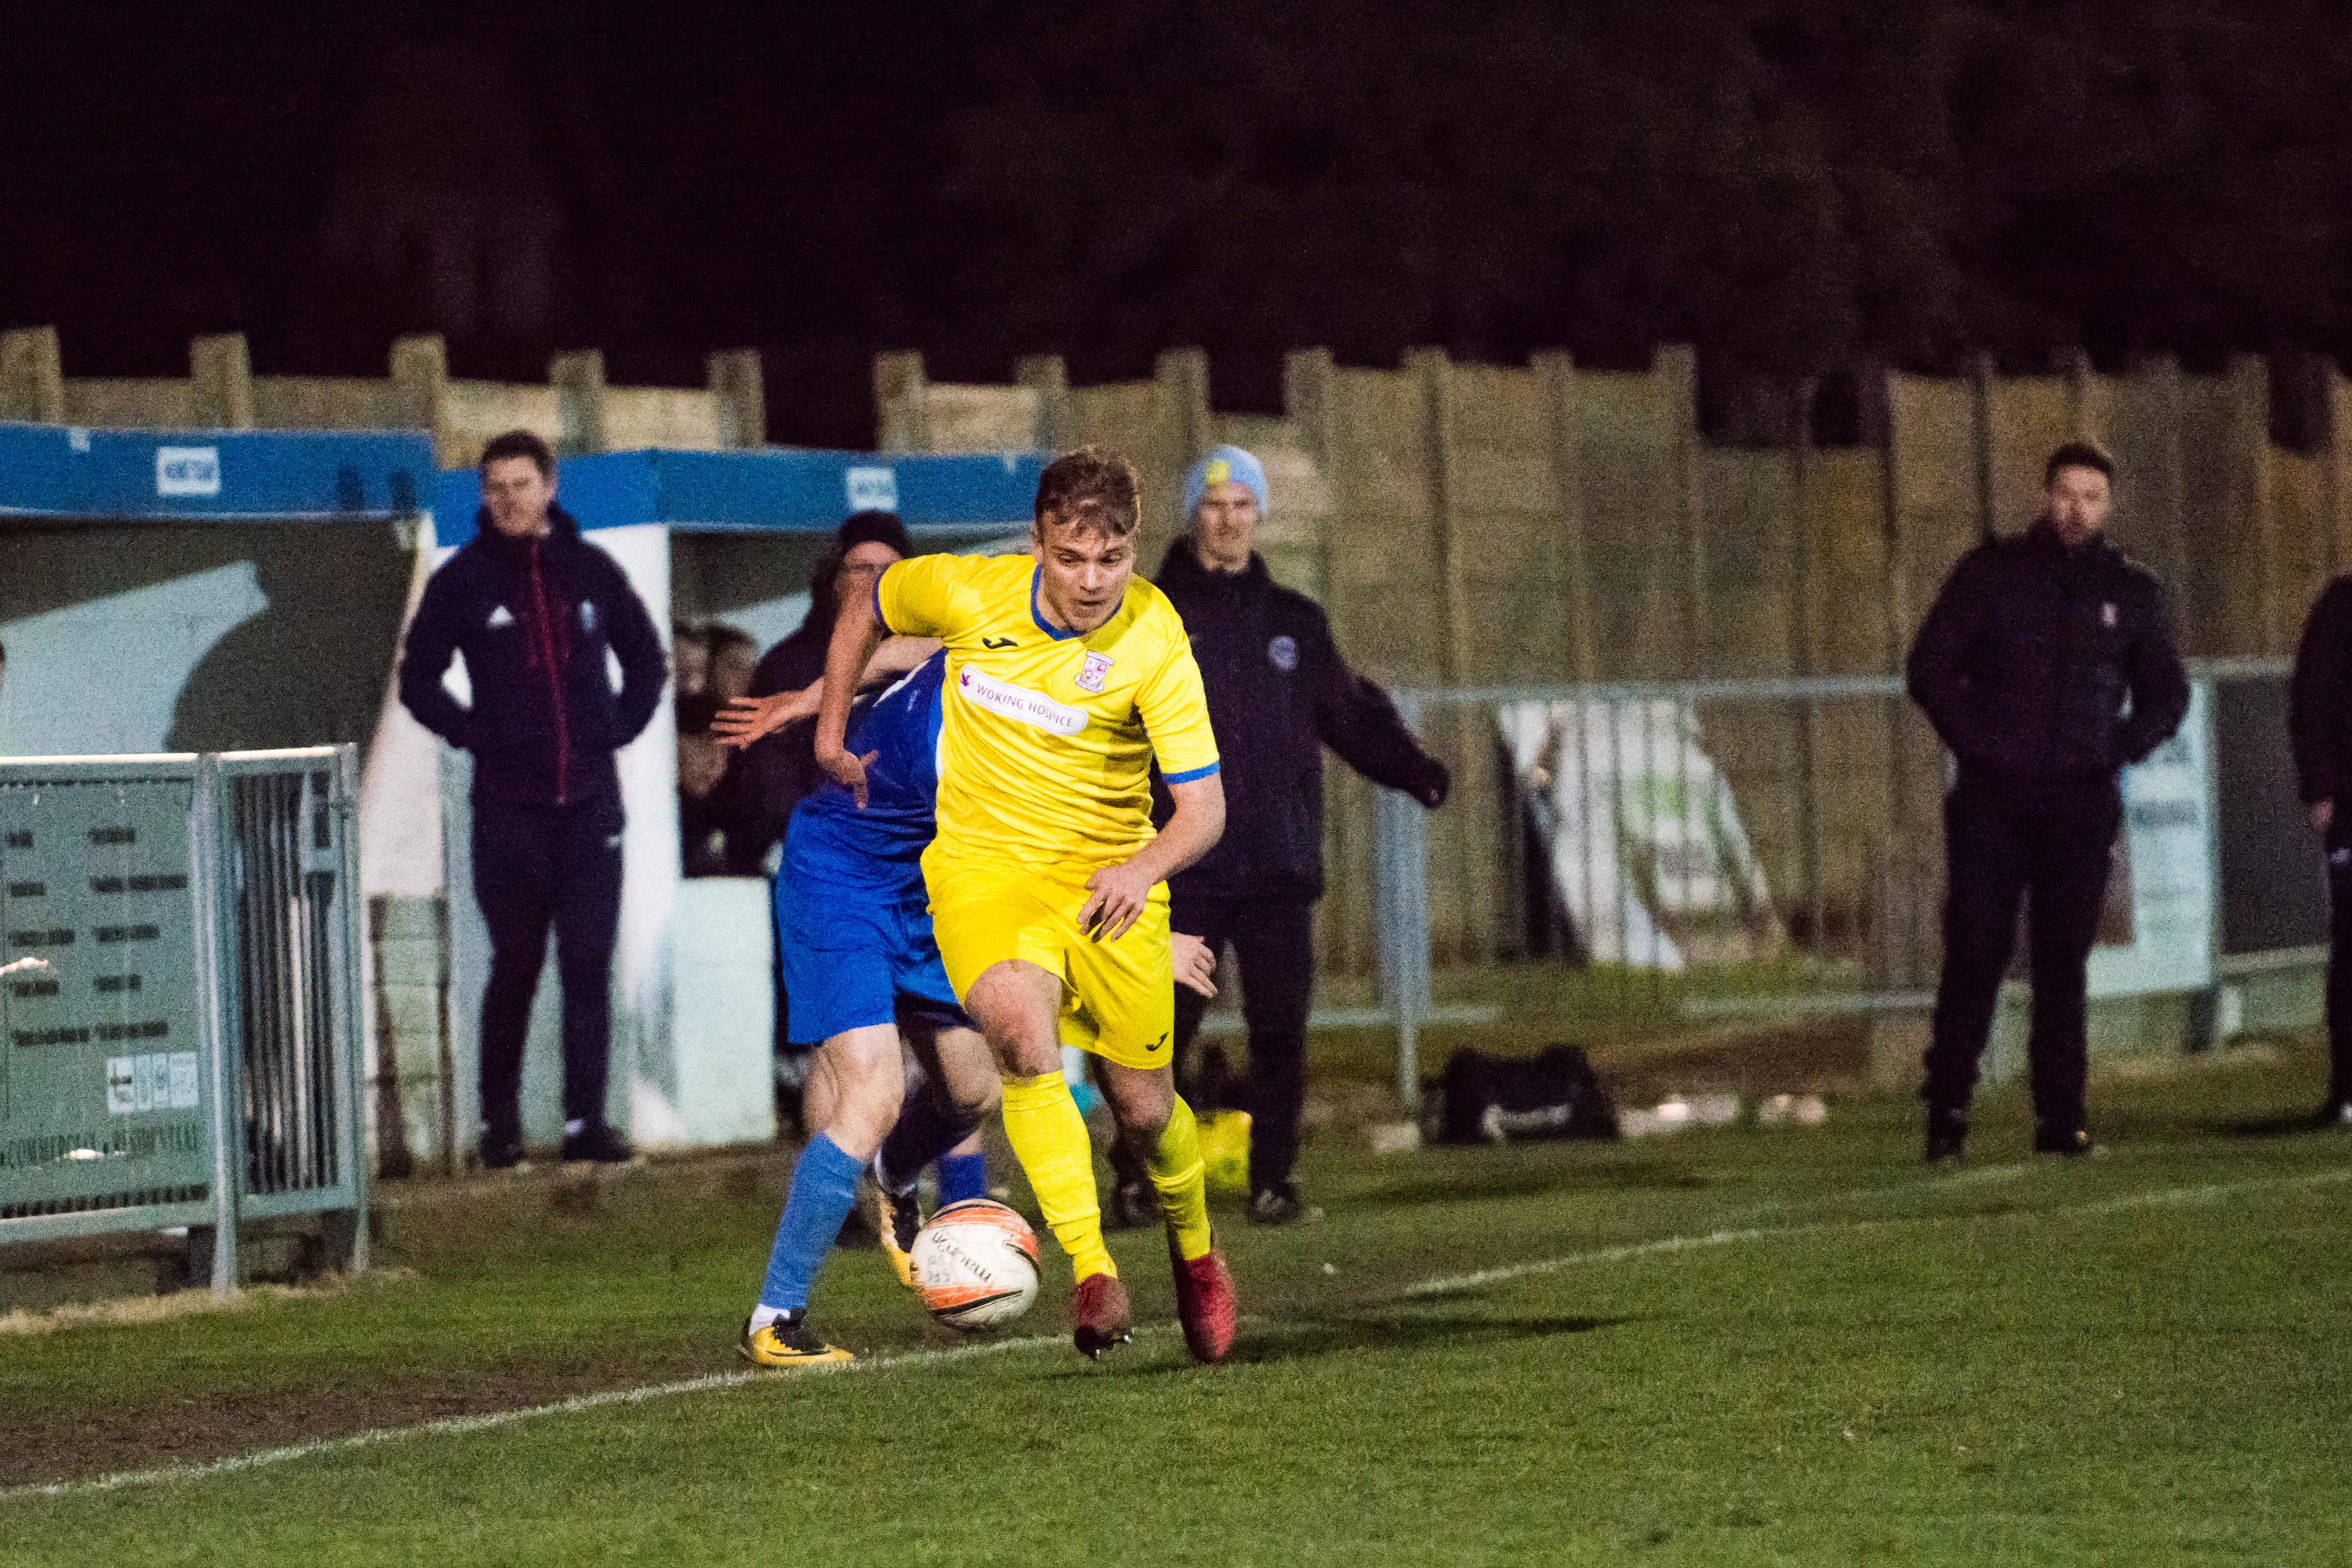 DAVID_JEFFERY Shoreham FC U18s vs Woking FC Academy 22.03.18 71